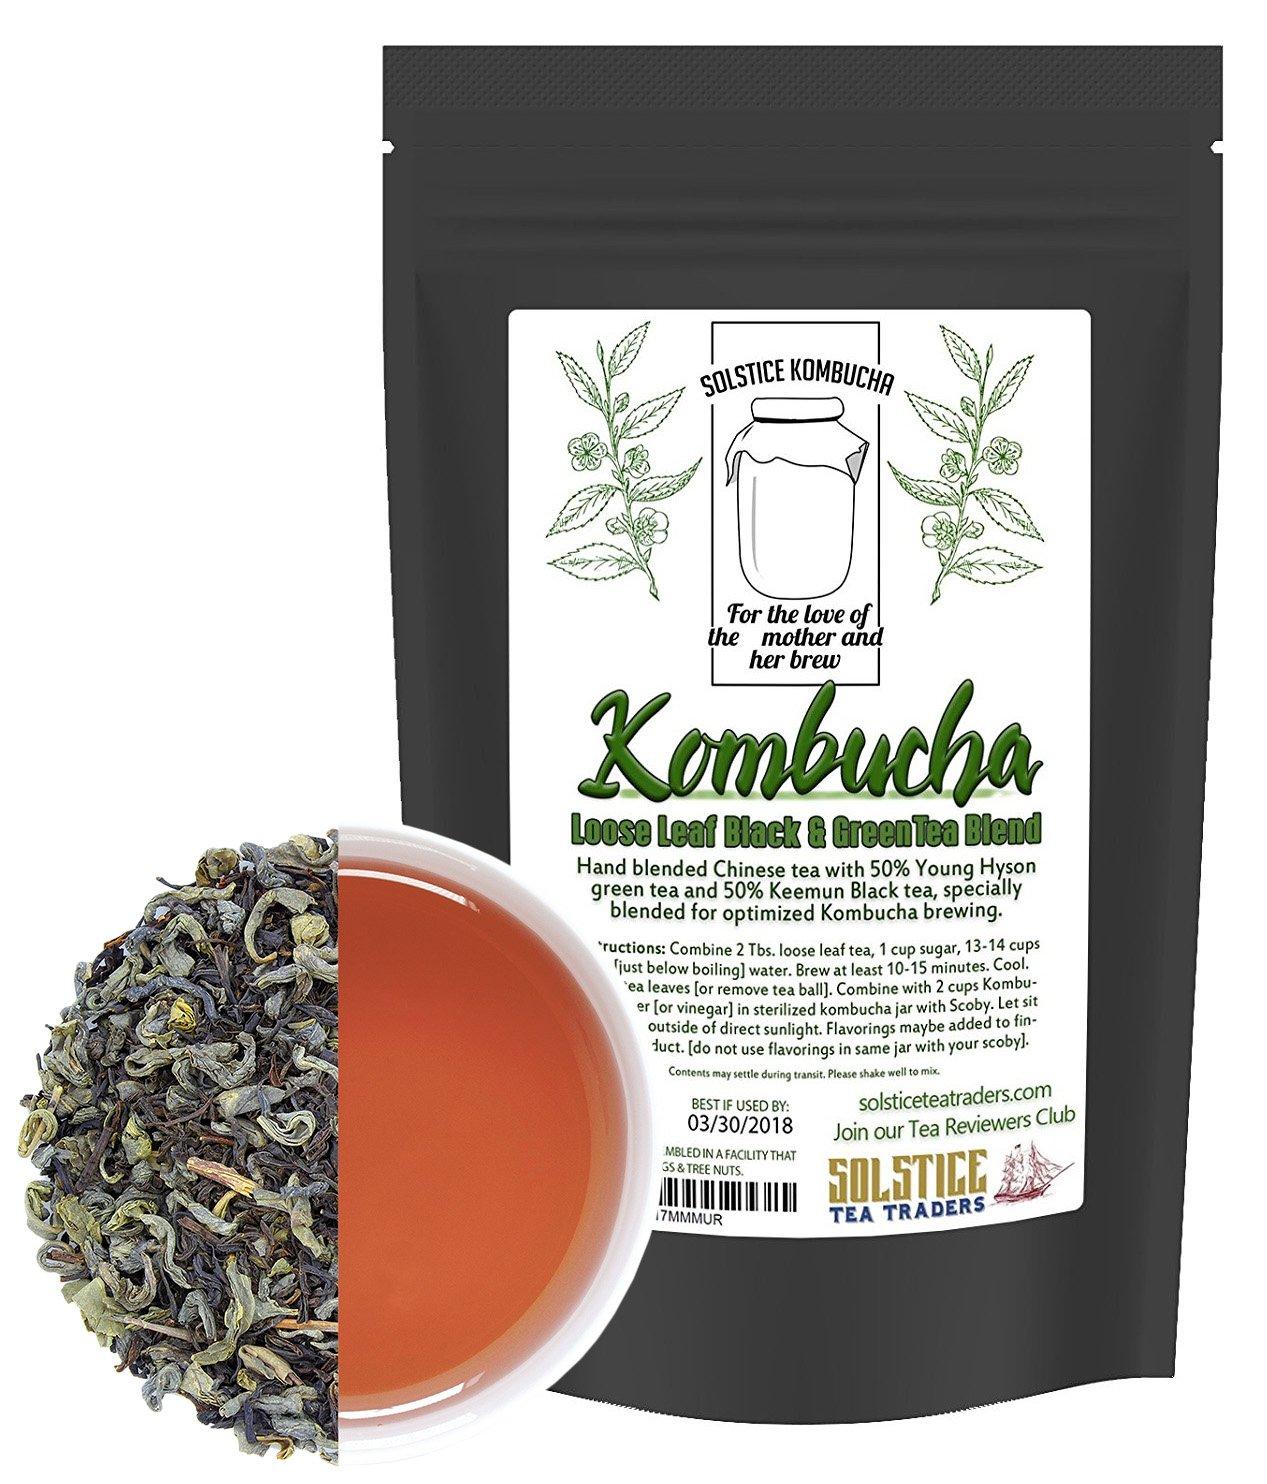 Kombucha Loose Leaf Black and Green Tea 50/50 Blend, 120 Servings, Keemun Black & China Young Hyson Green Tea for Brewing Kombucha (8-Ounces Total)